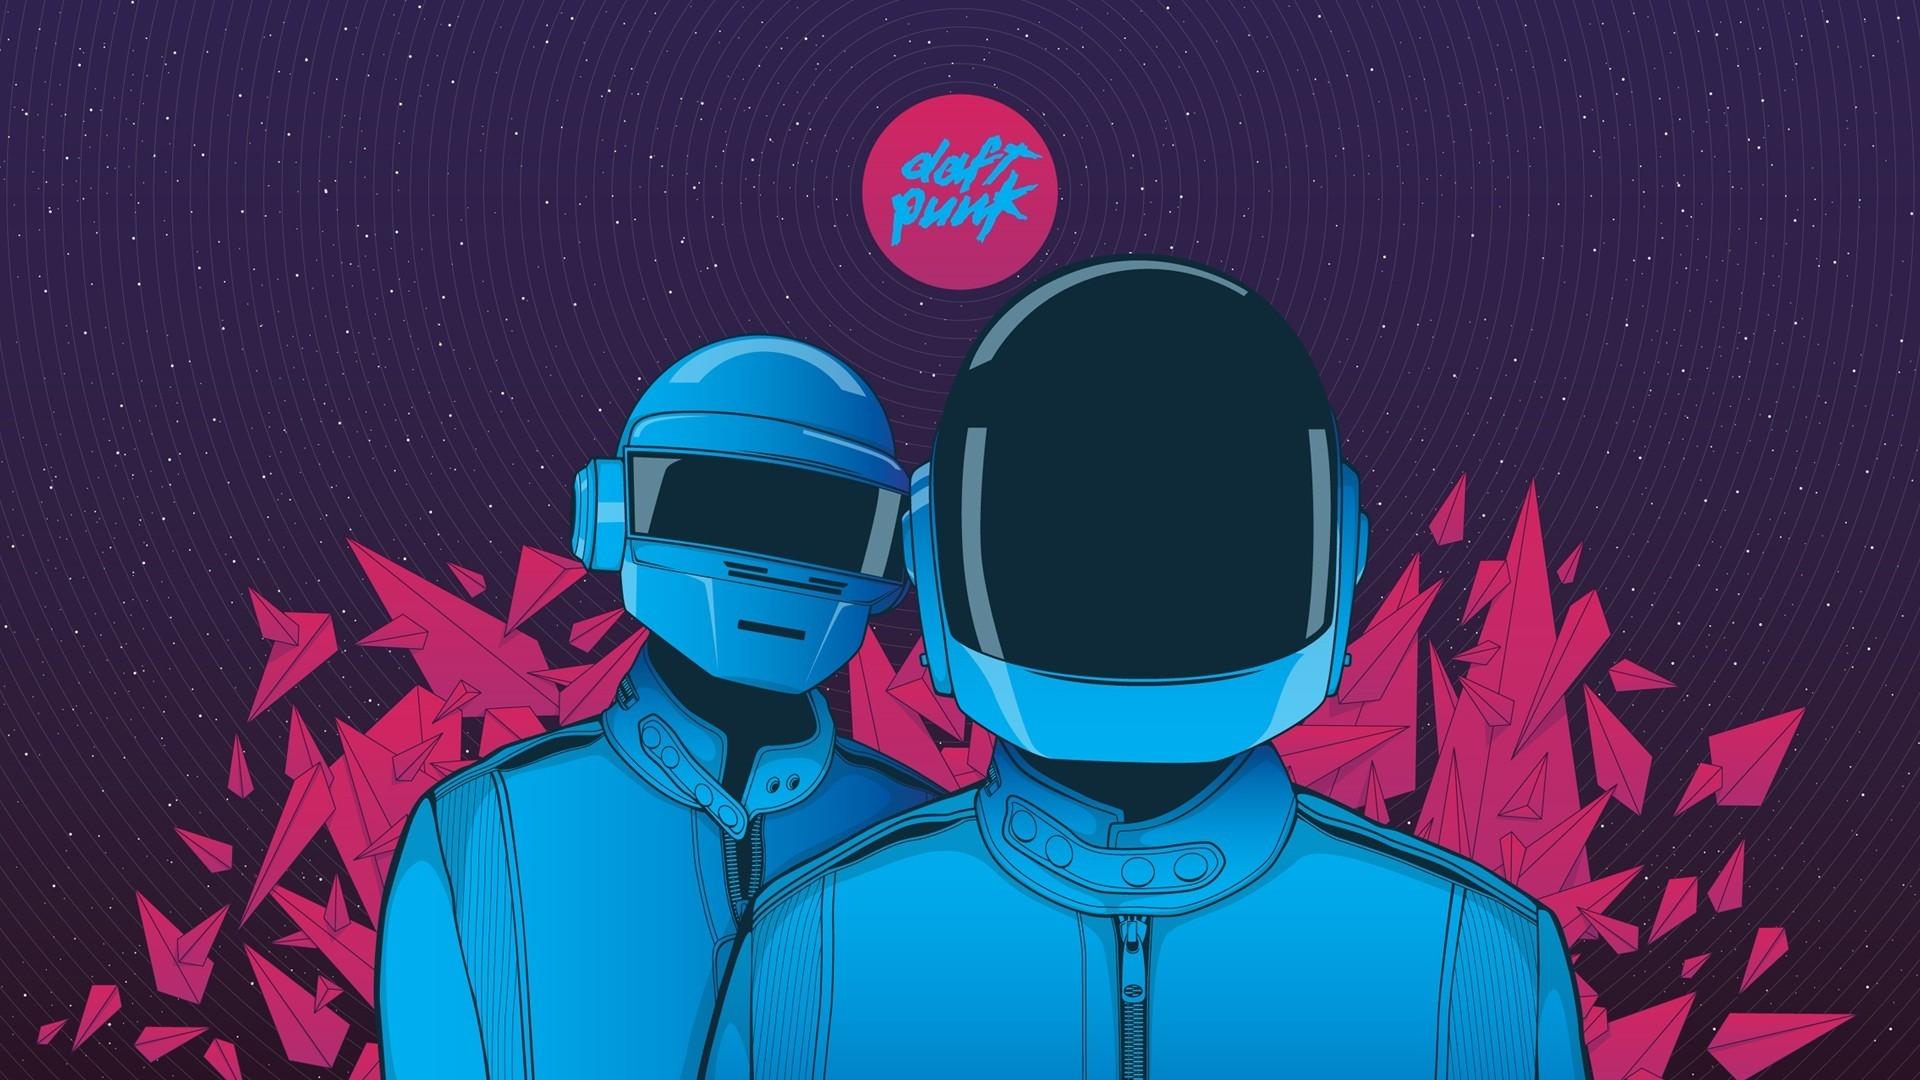 Illustration Music Cartoon Helmet Daft Punk ART Graphic Screenshot Computer Wallpaper